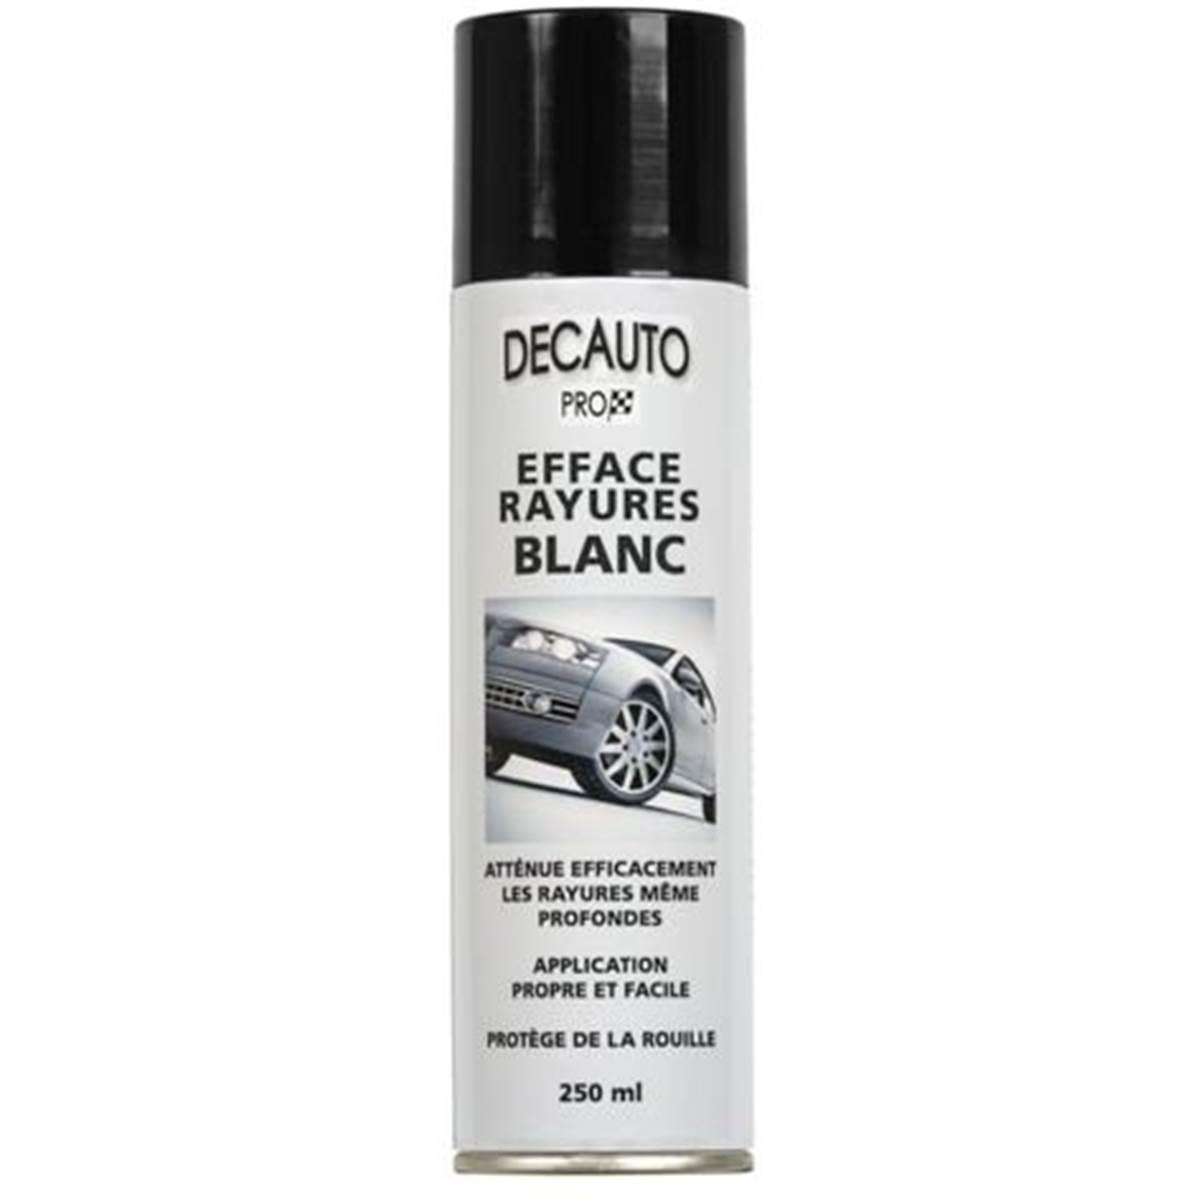 Efface rayures blanc en spray, 250 ml